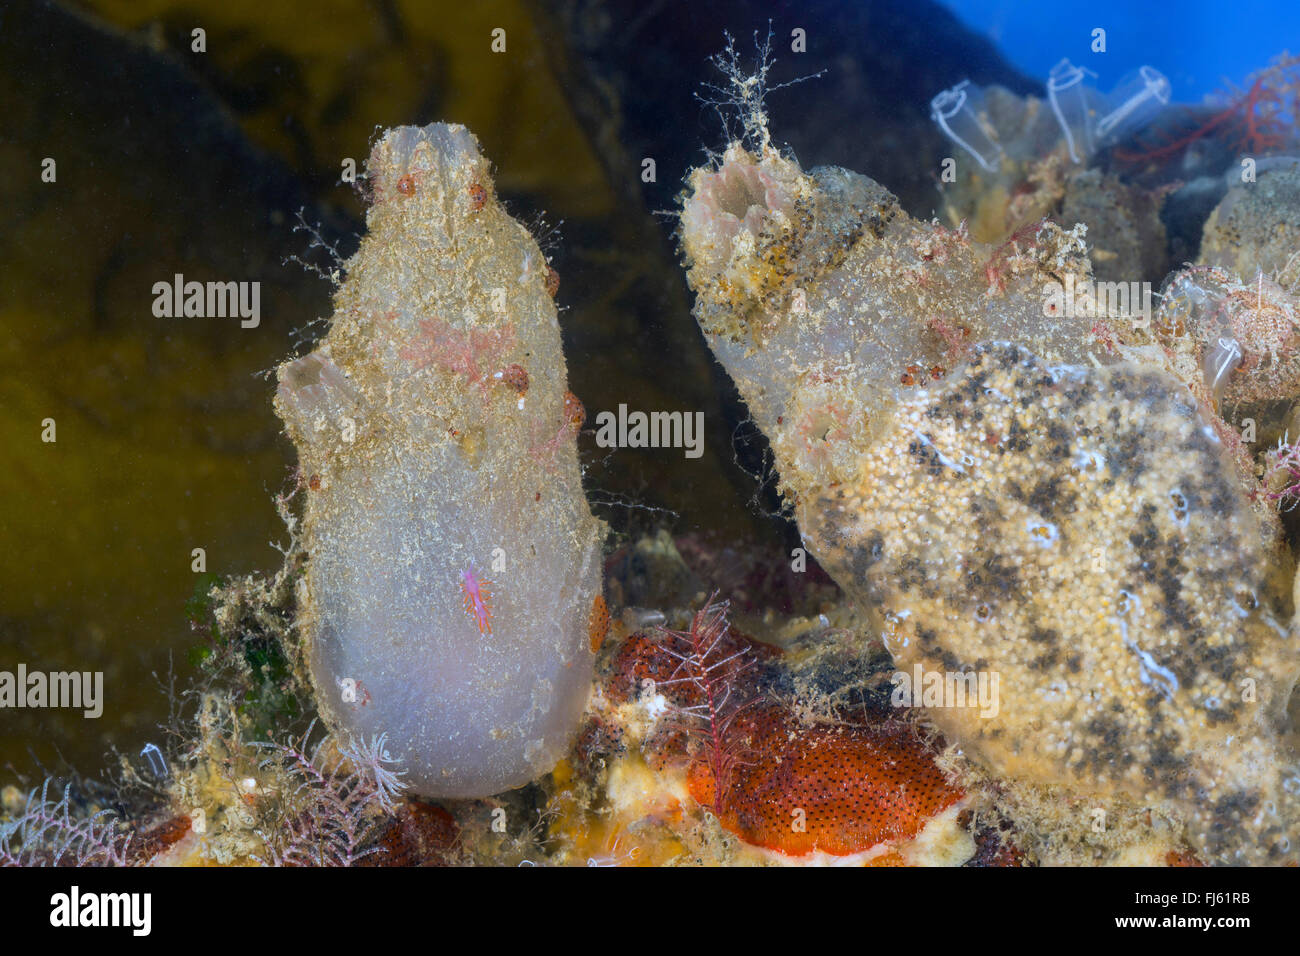 rough sea-squirt (Ascidiella aspersa, Ascidia aspersa), two rough sea-squirts - Stock Image